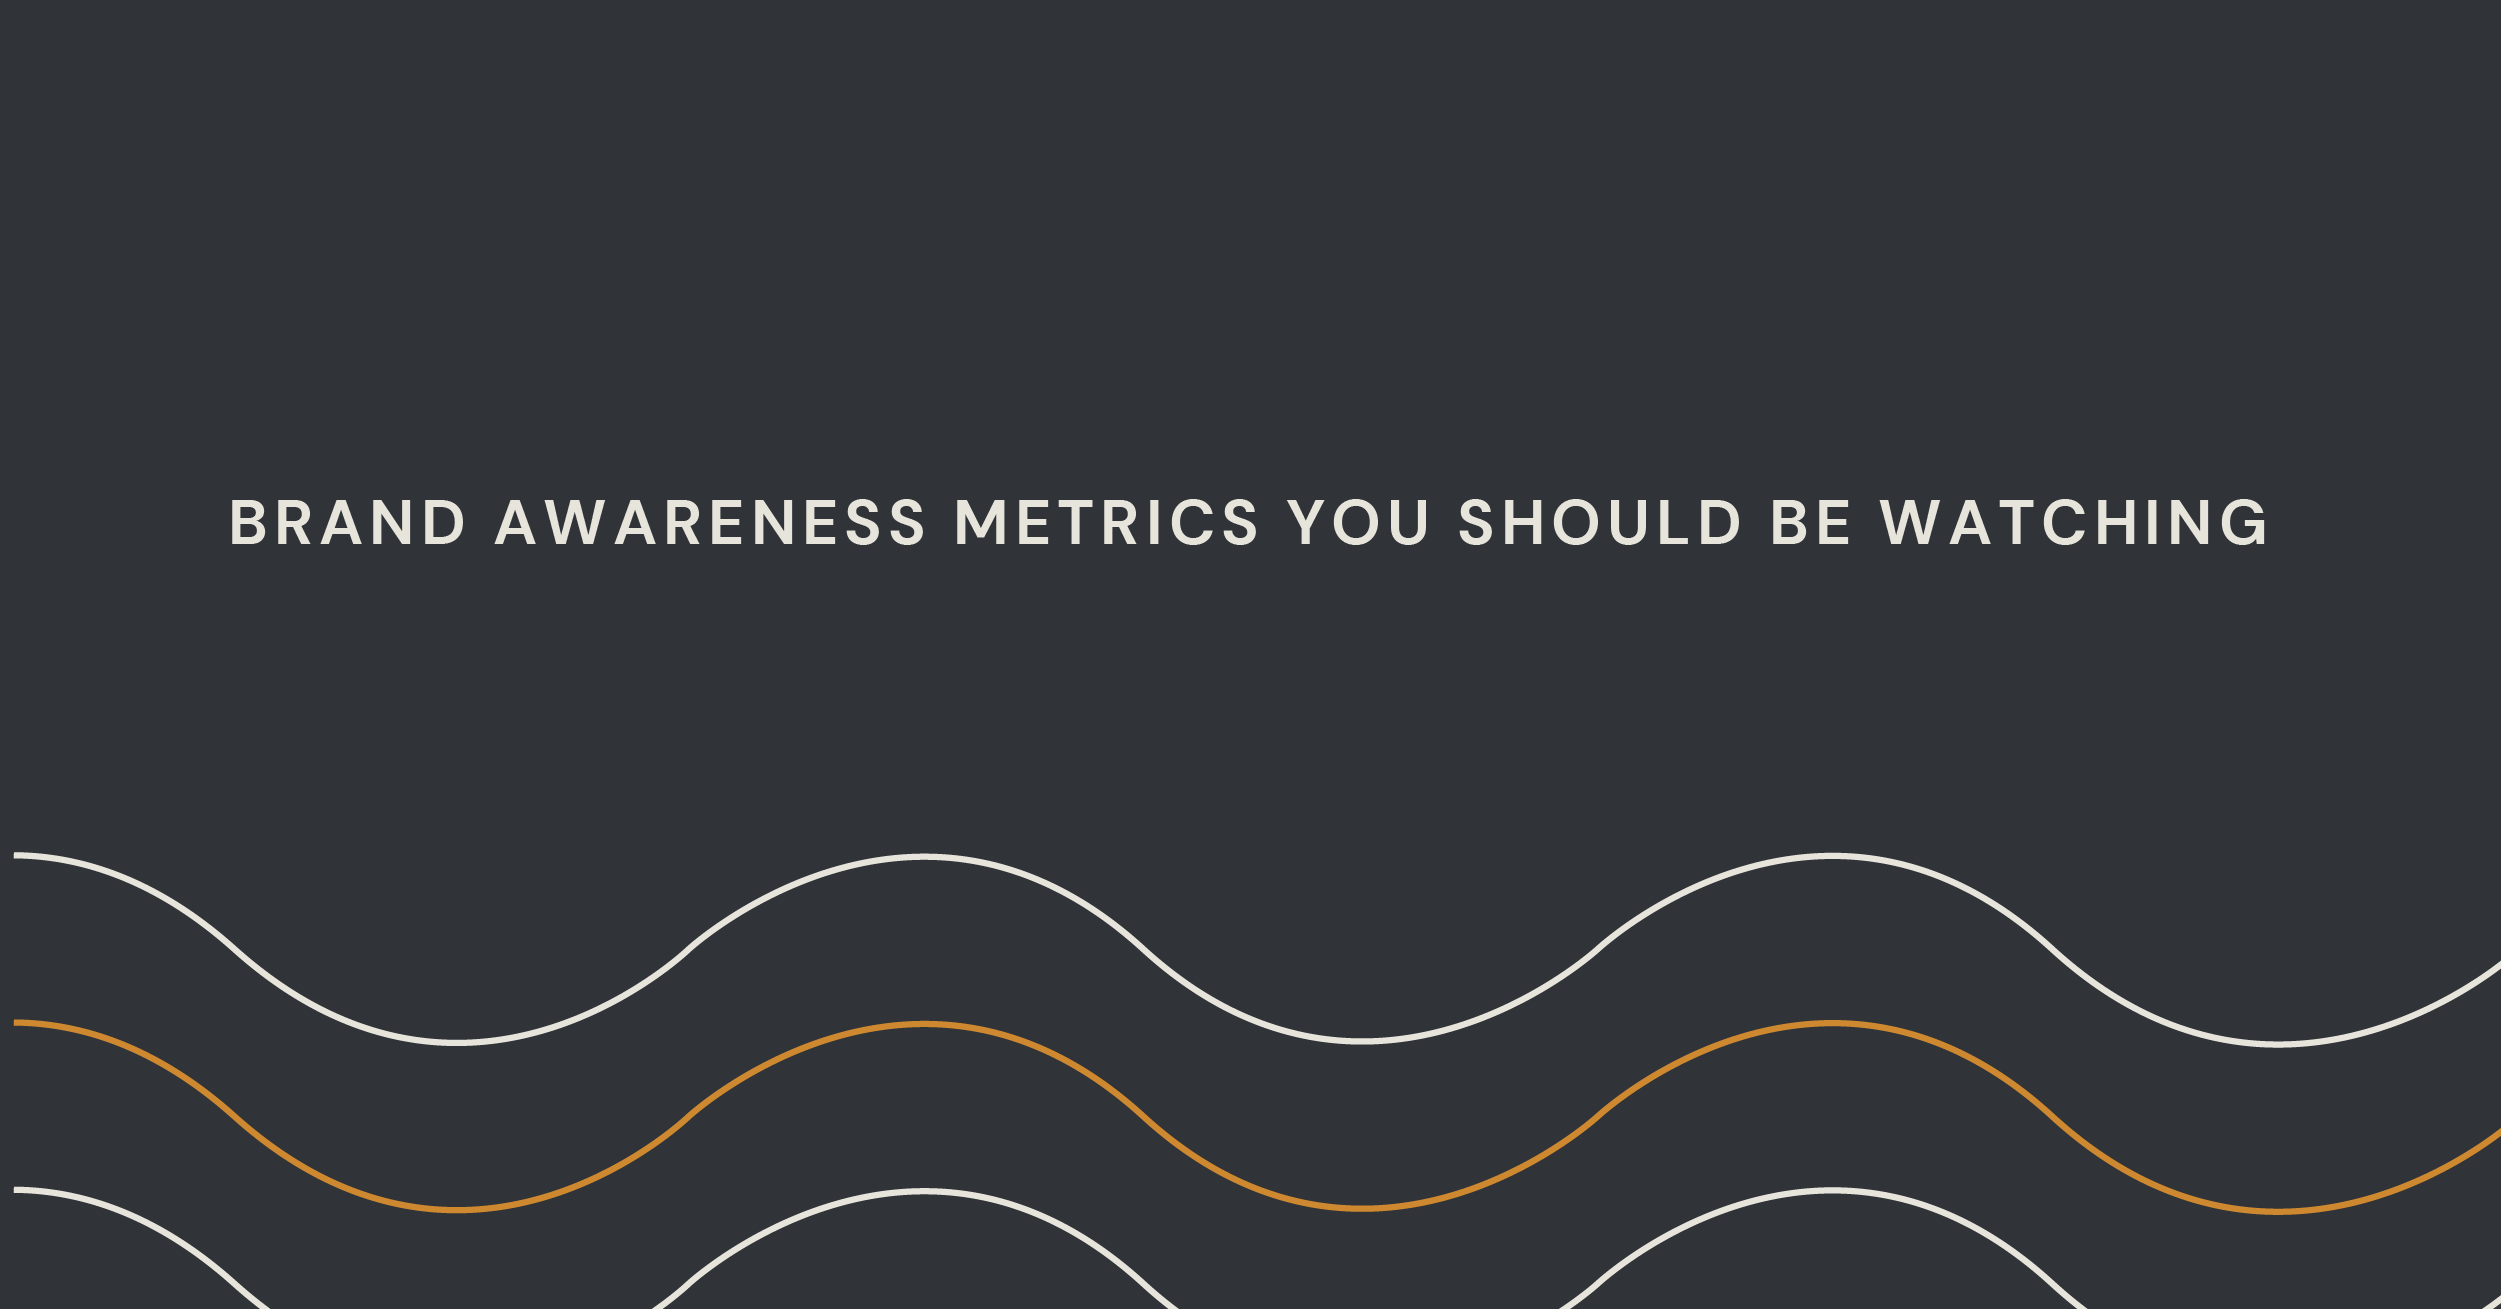 brand awareness metrics